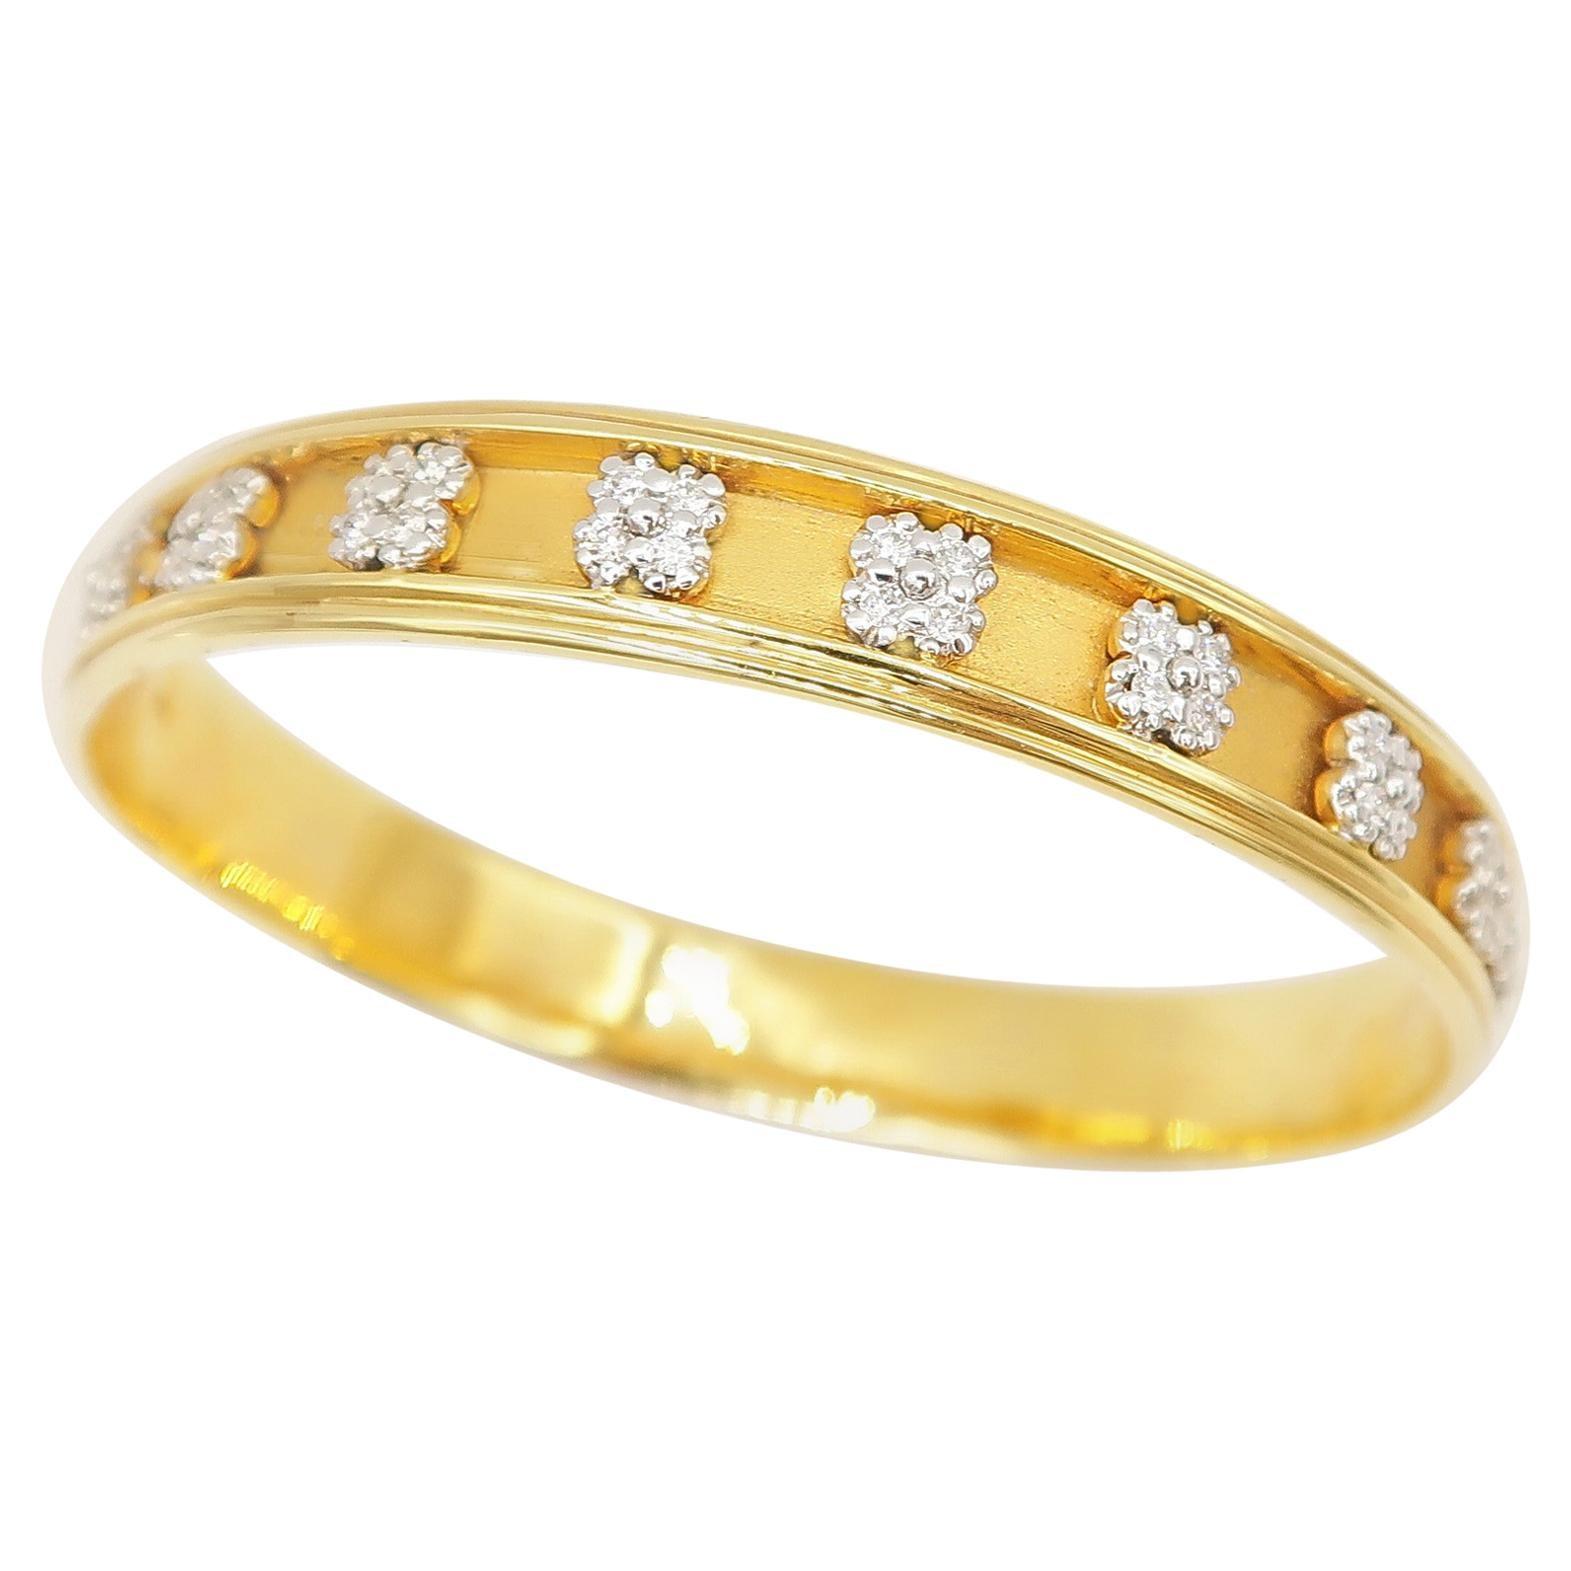 Four Petal Flower Diamond Motif Bangle in 18 Karat Yellow Gold